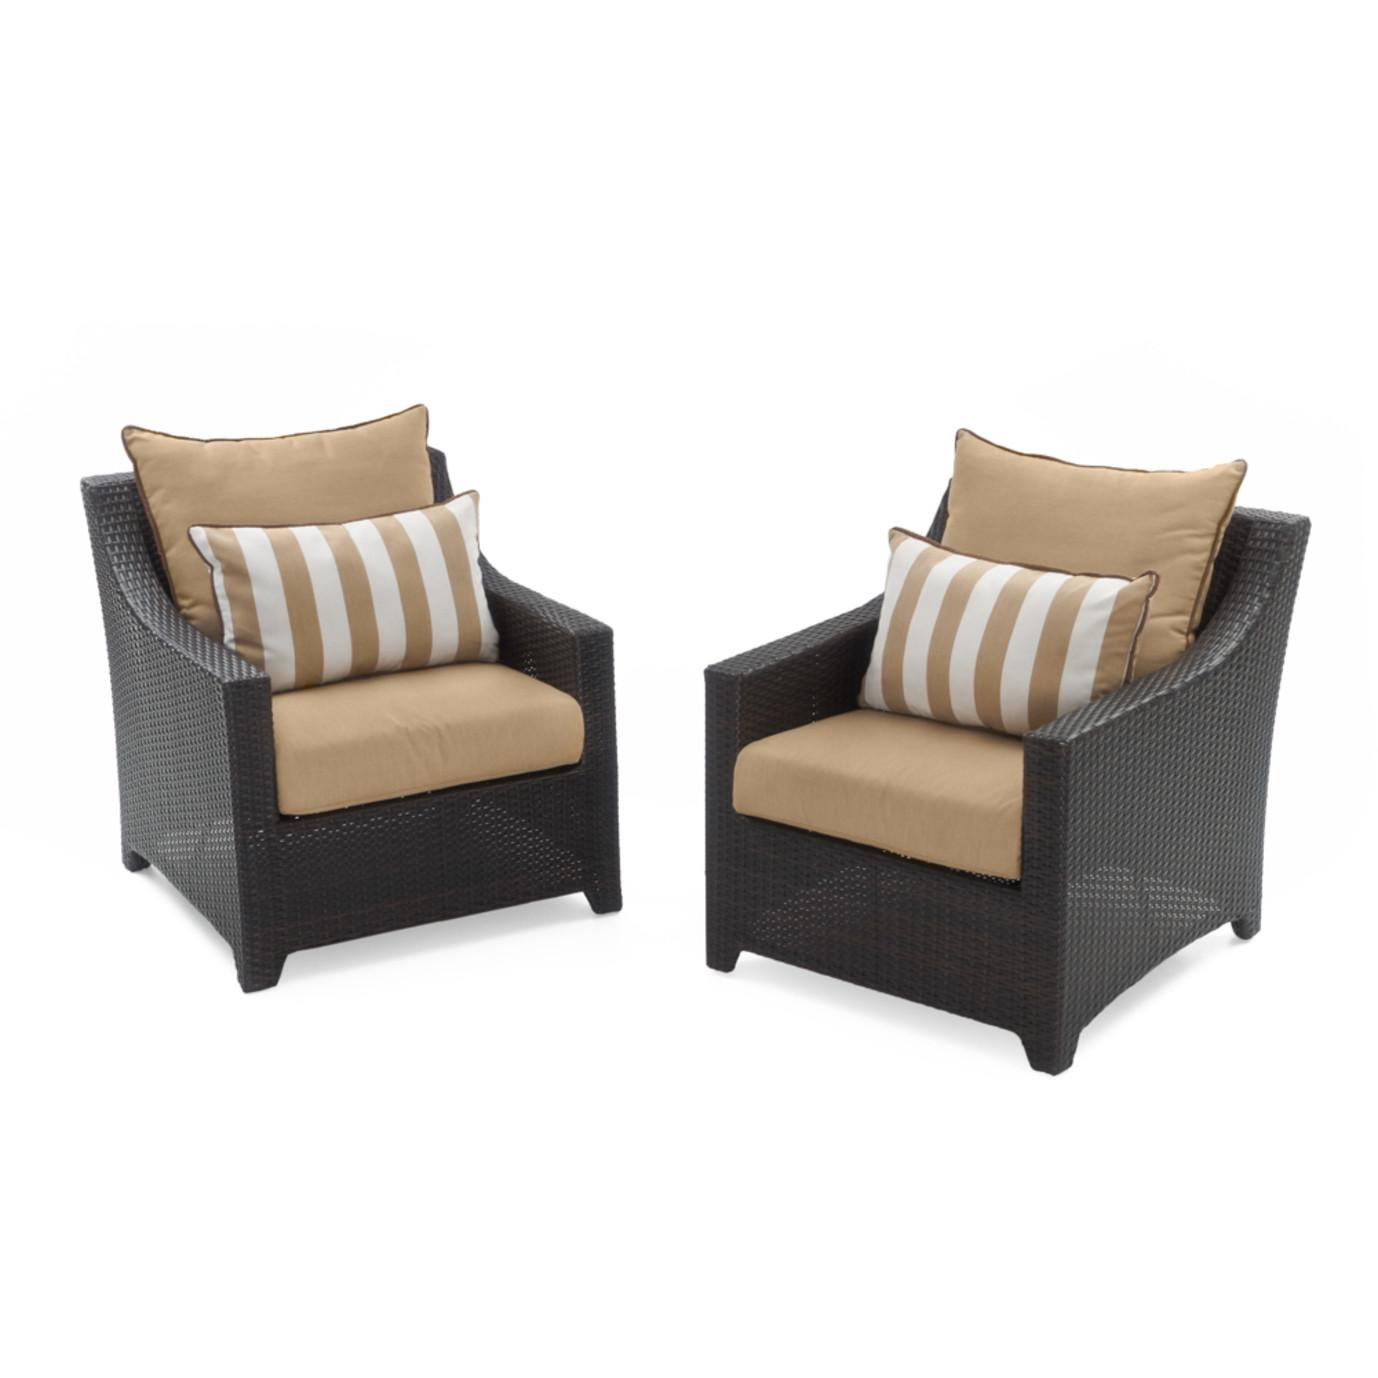 Deco™ Club Chairs - Maxim Beige